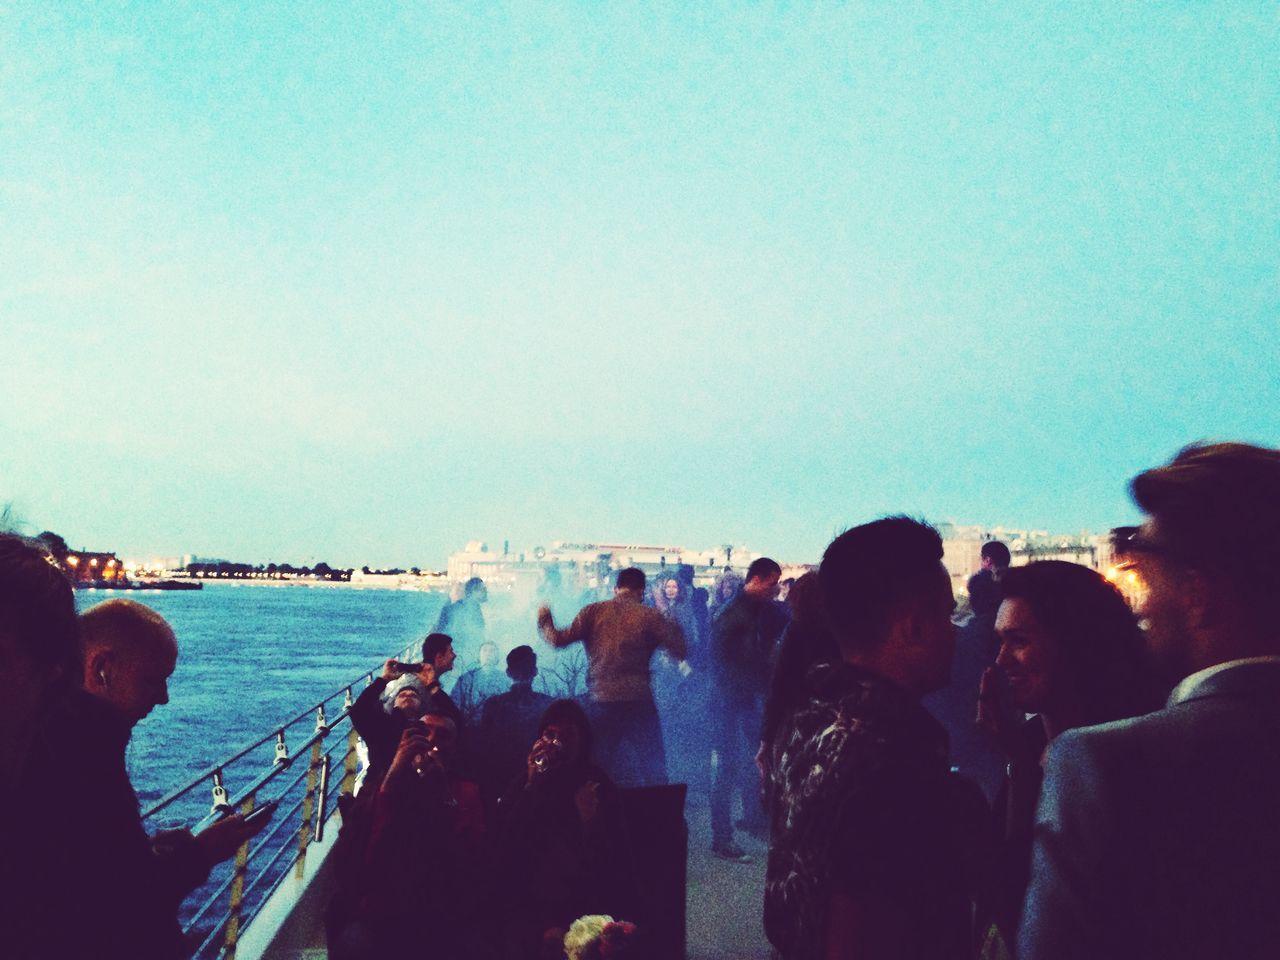 People Enjoying In Party At Seaside